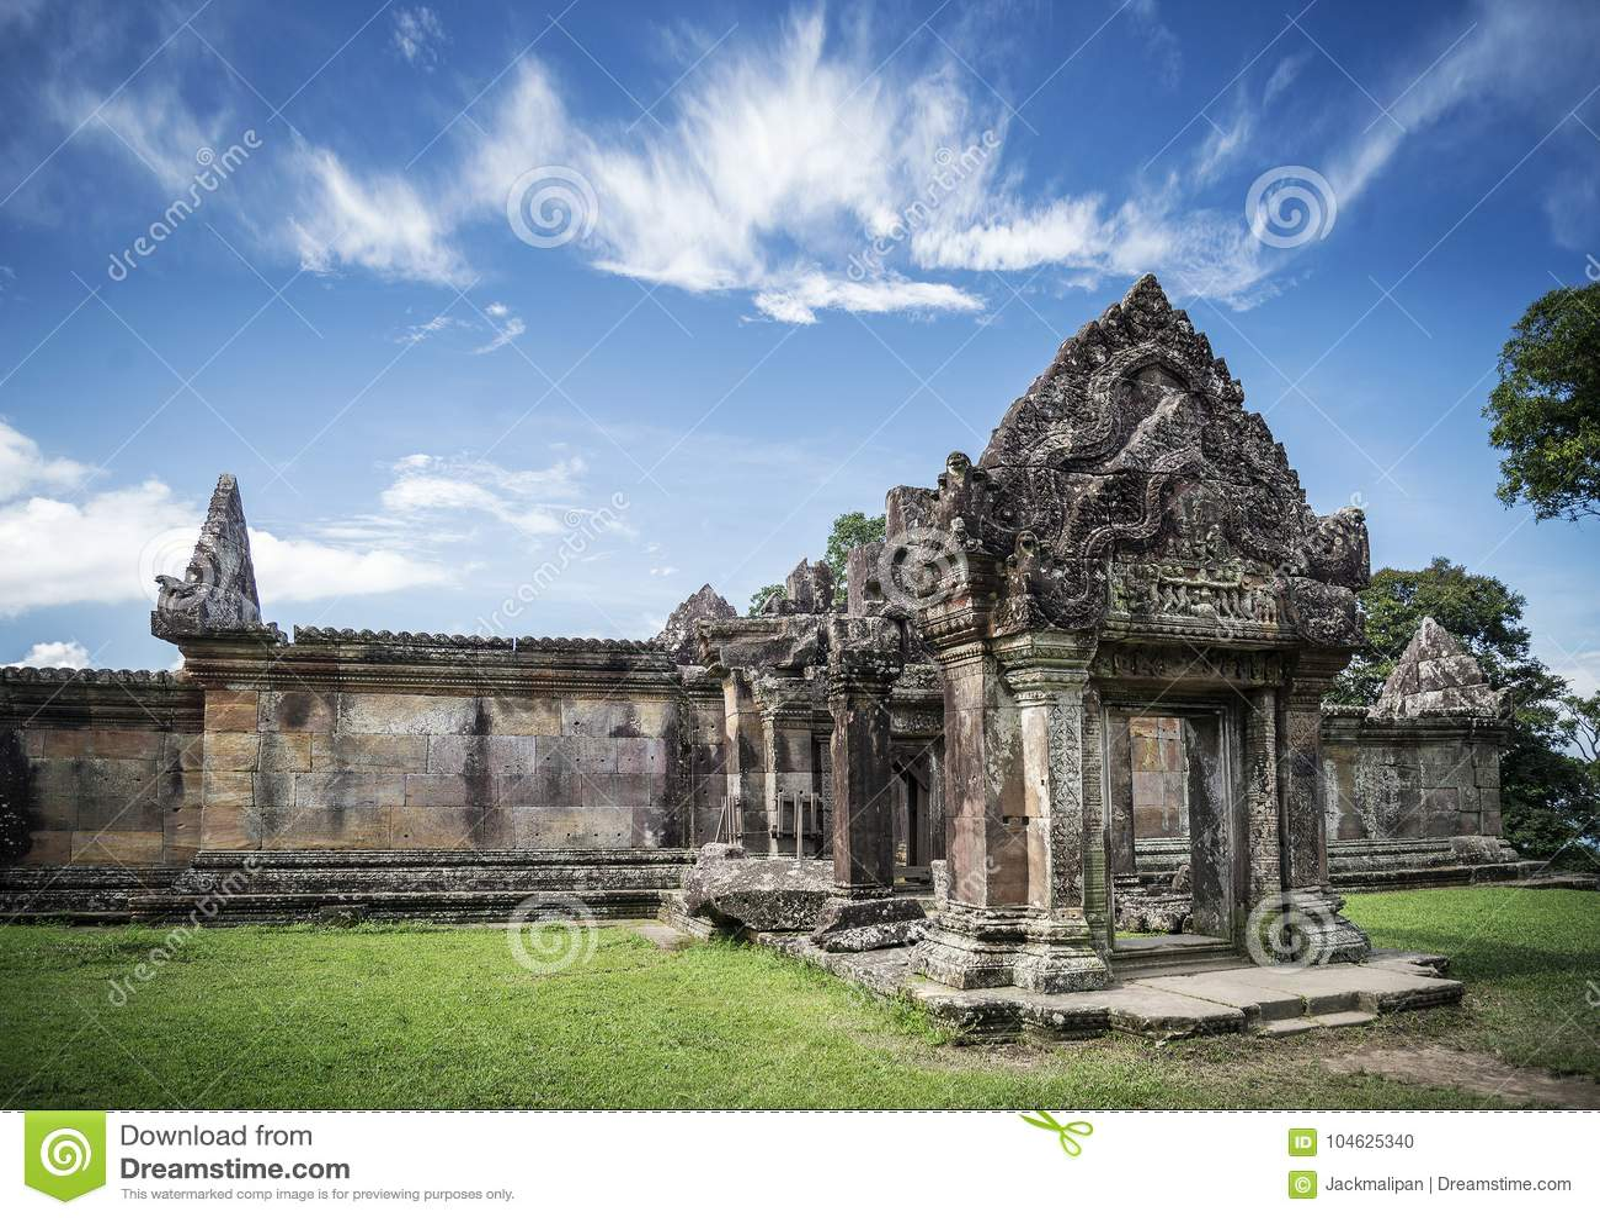 Download Oriëntatiepunt Van De Tempelruïnes Van Preahvihear Het Oude Khmer In Kambodja Stock Foto - Afbeelding bestaande uit detail, erfenis: 104625340